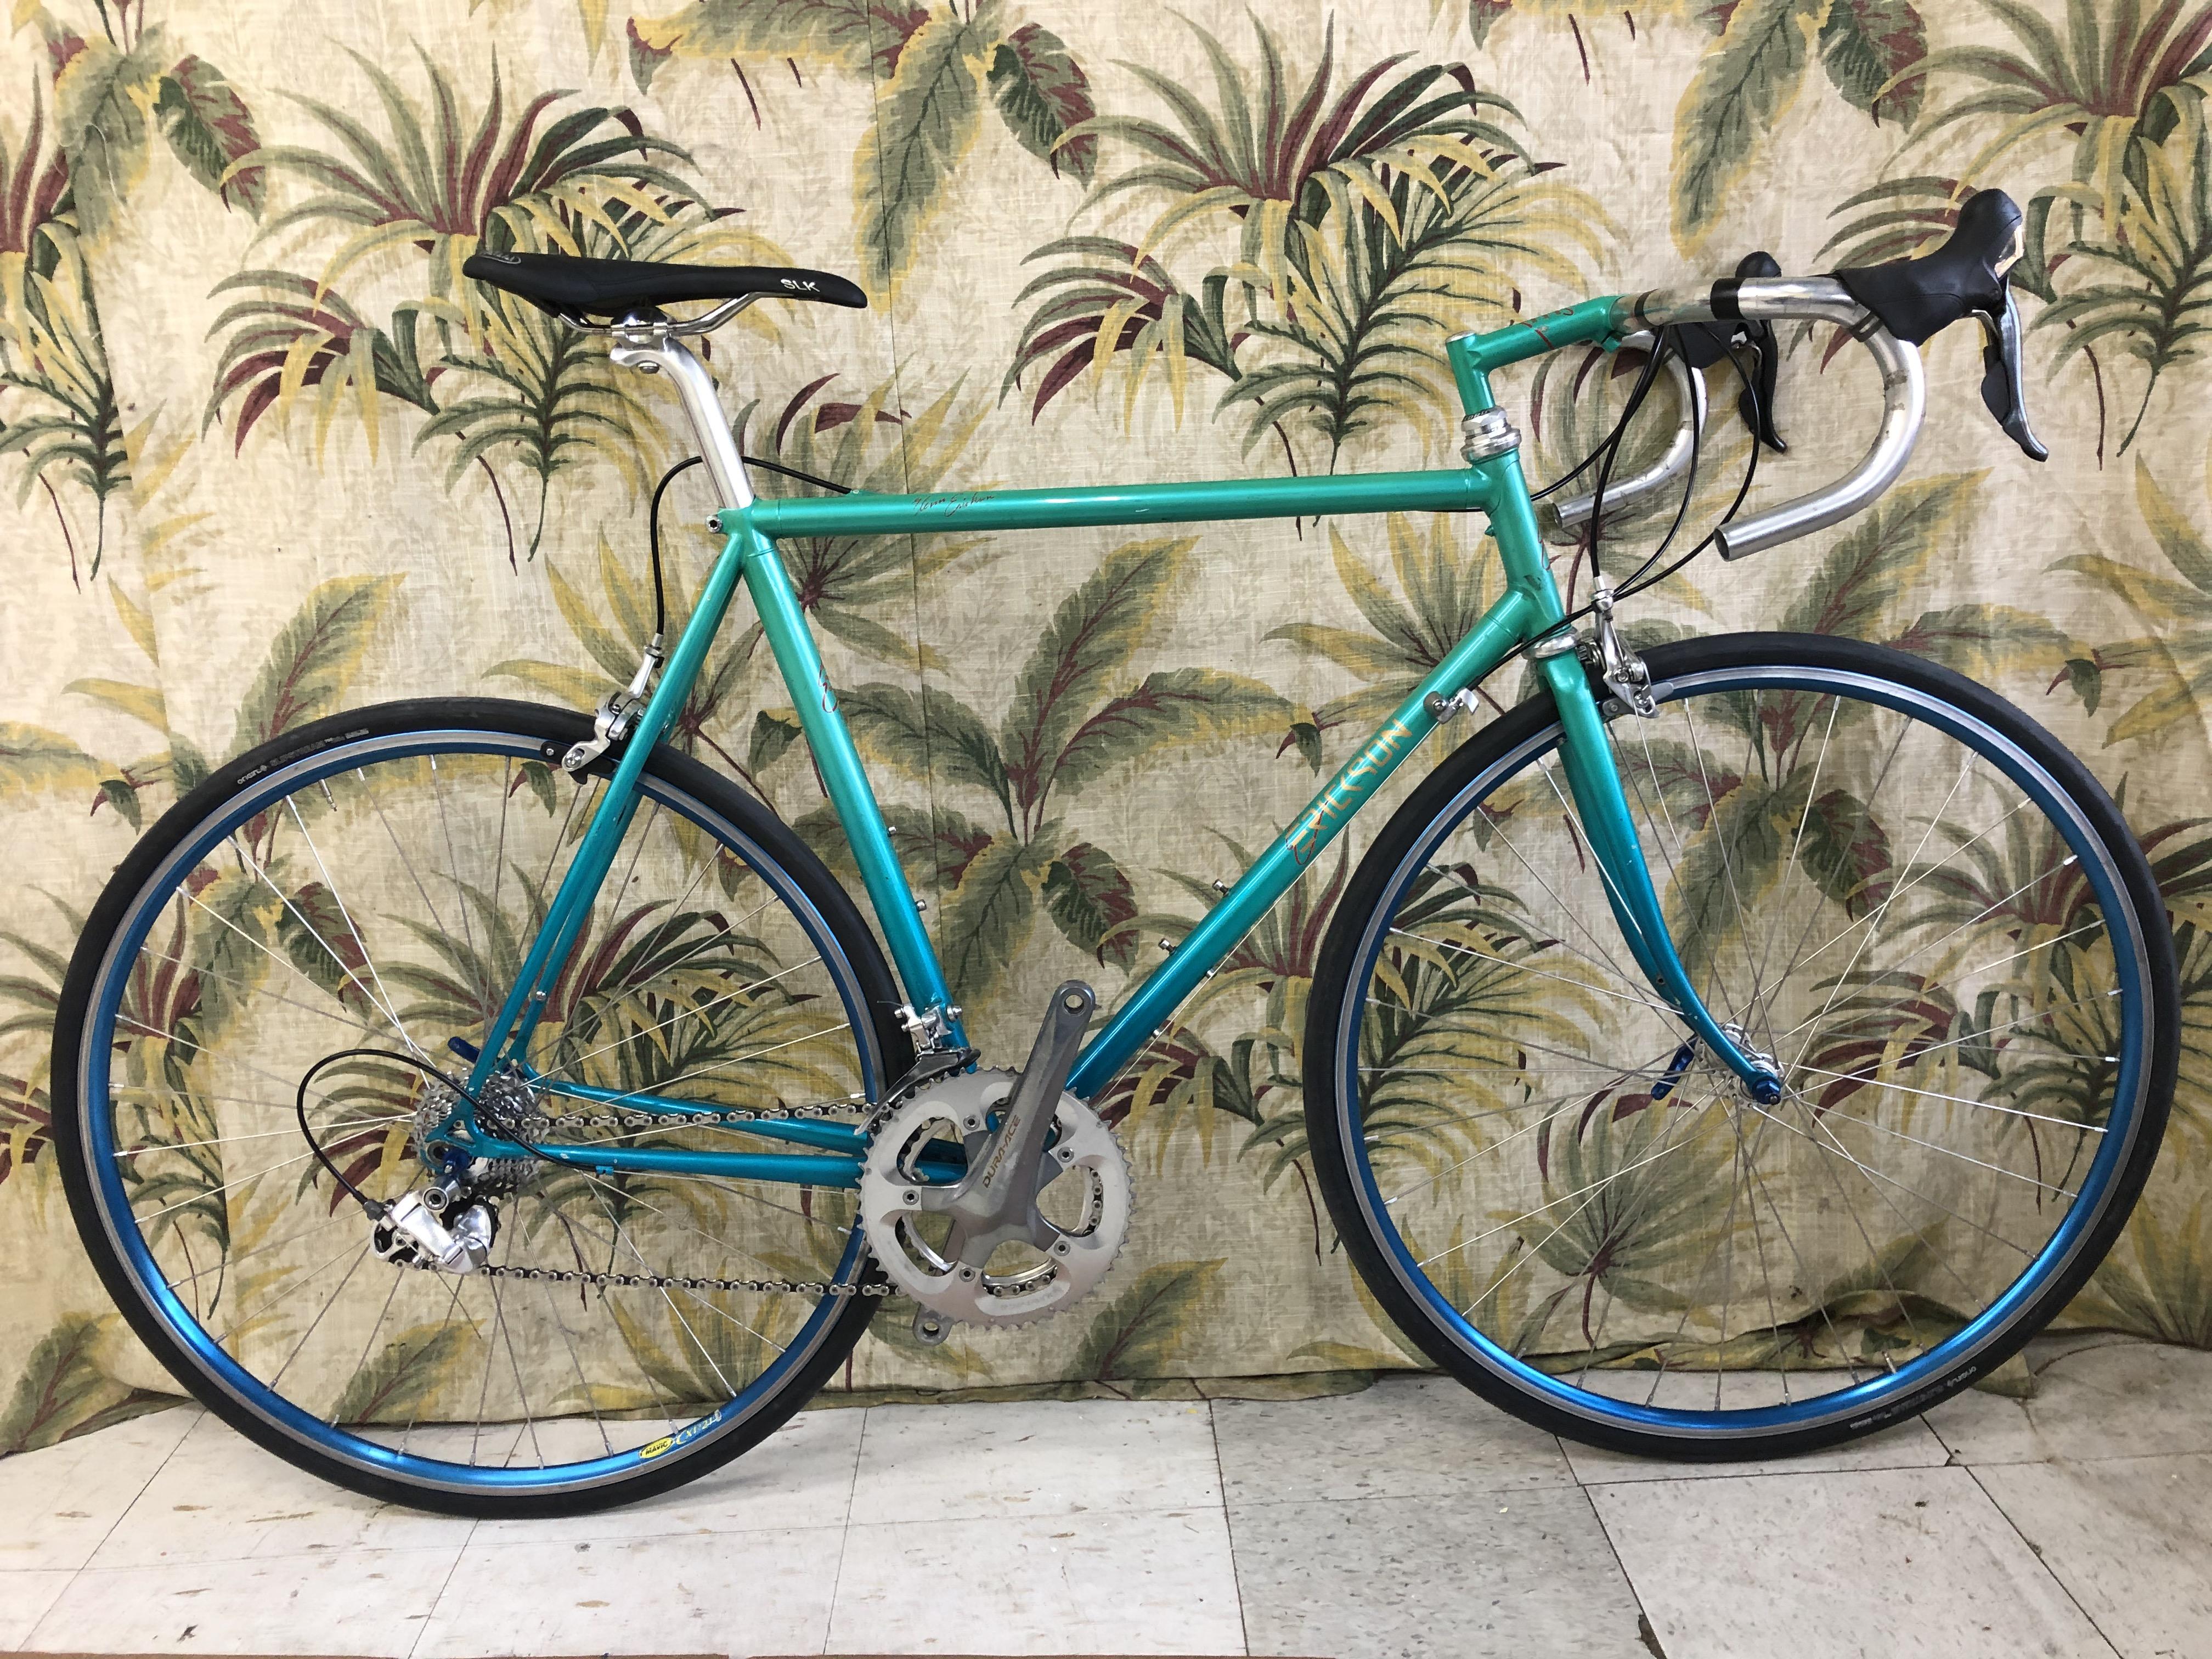 56cm Erickson - $850